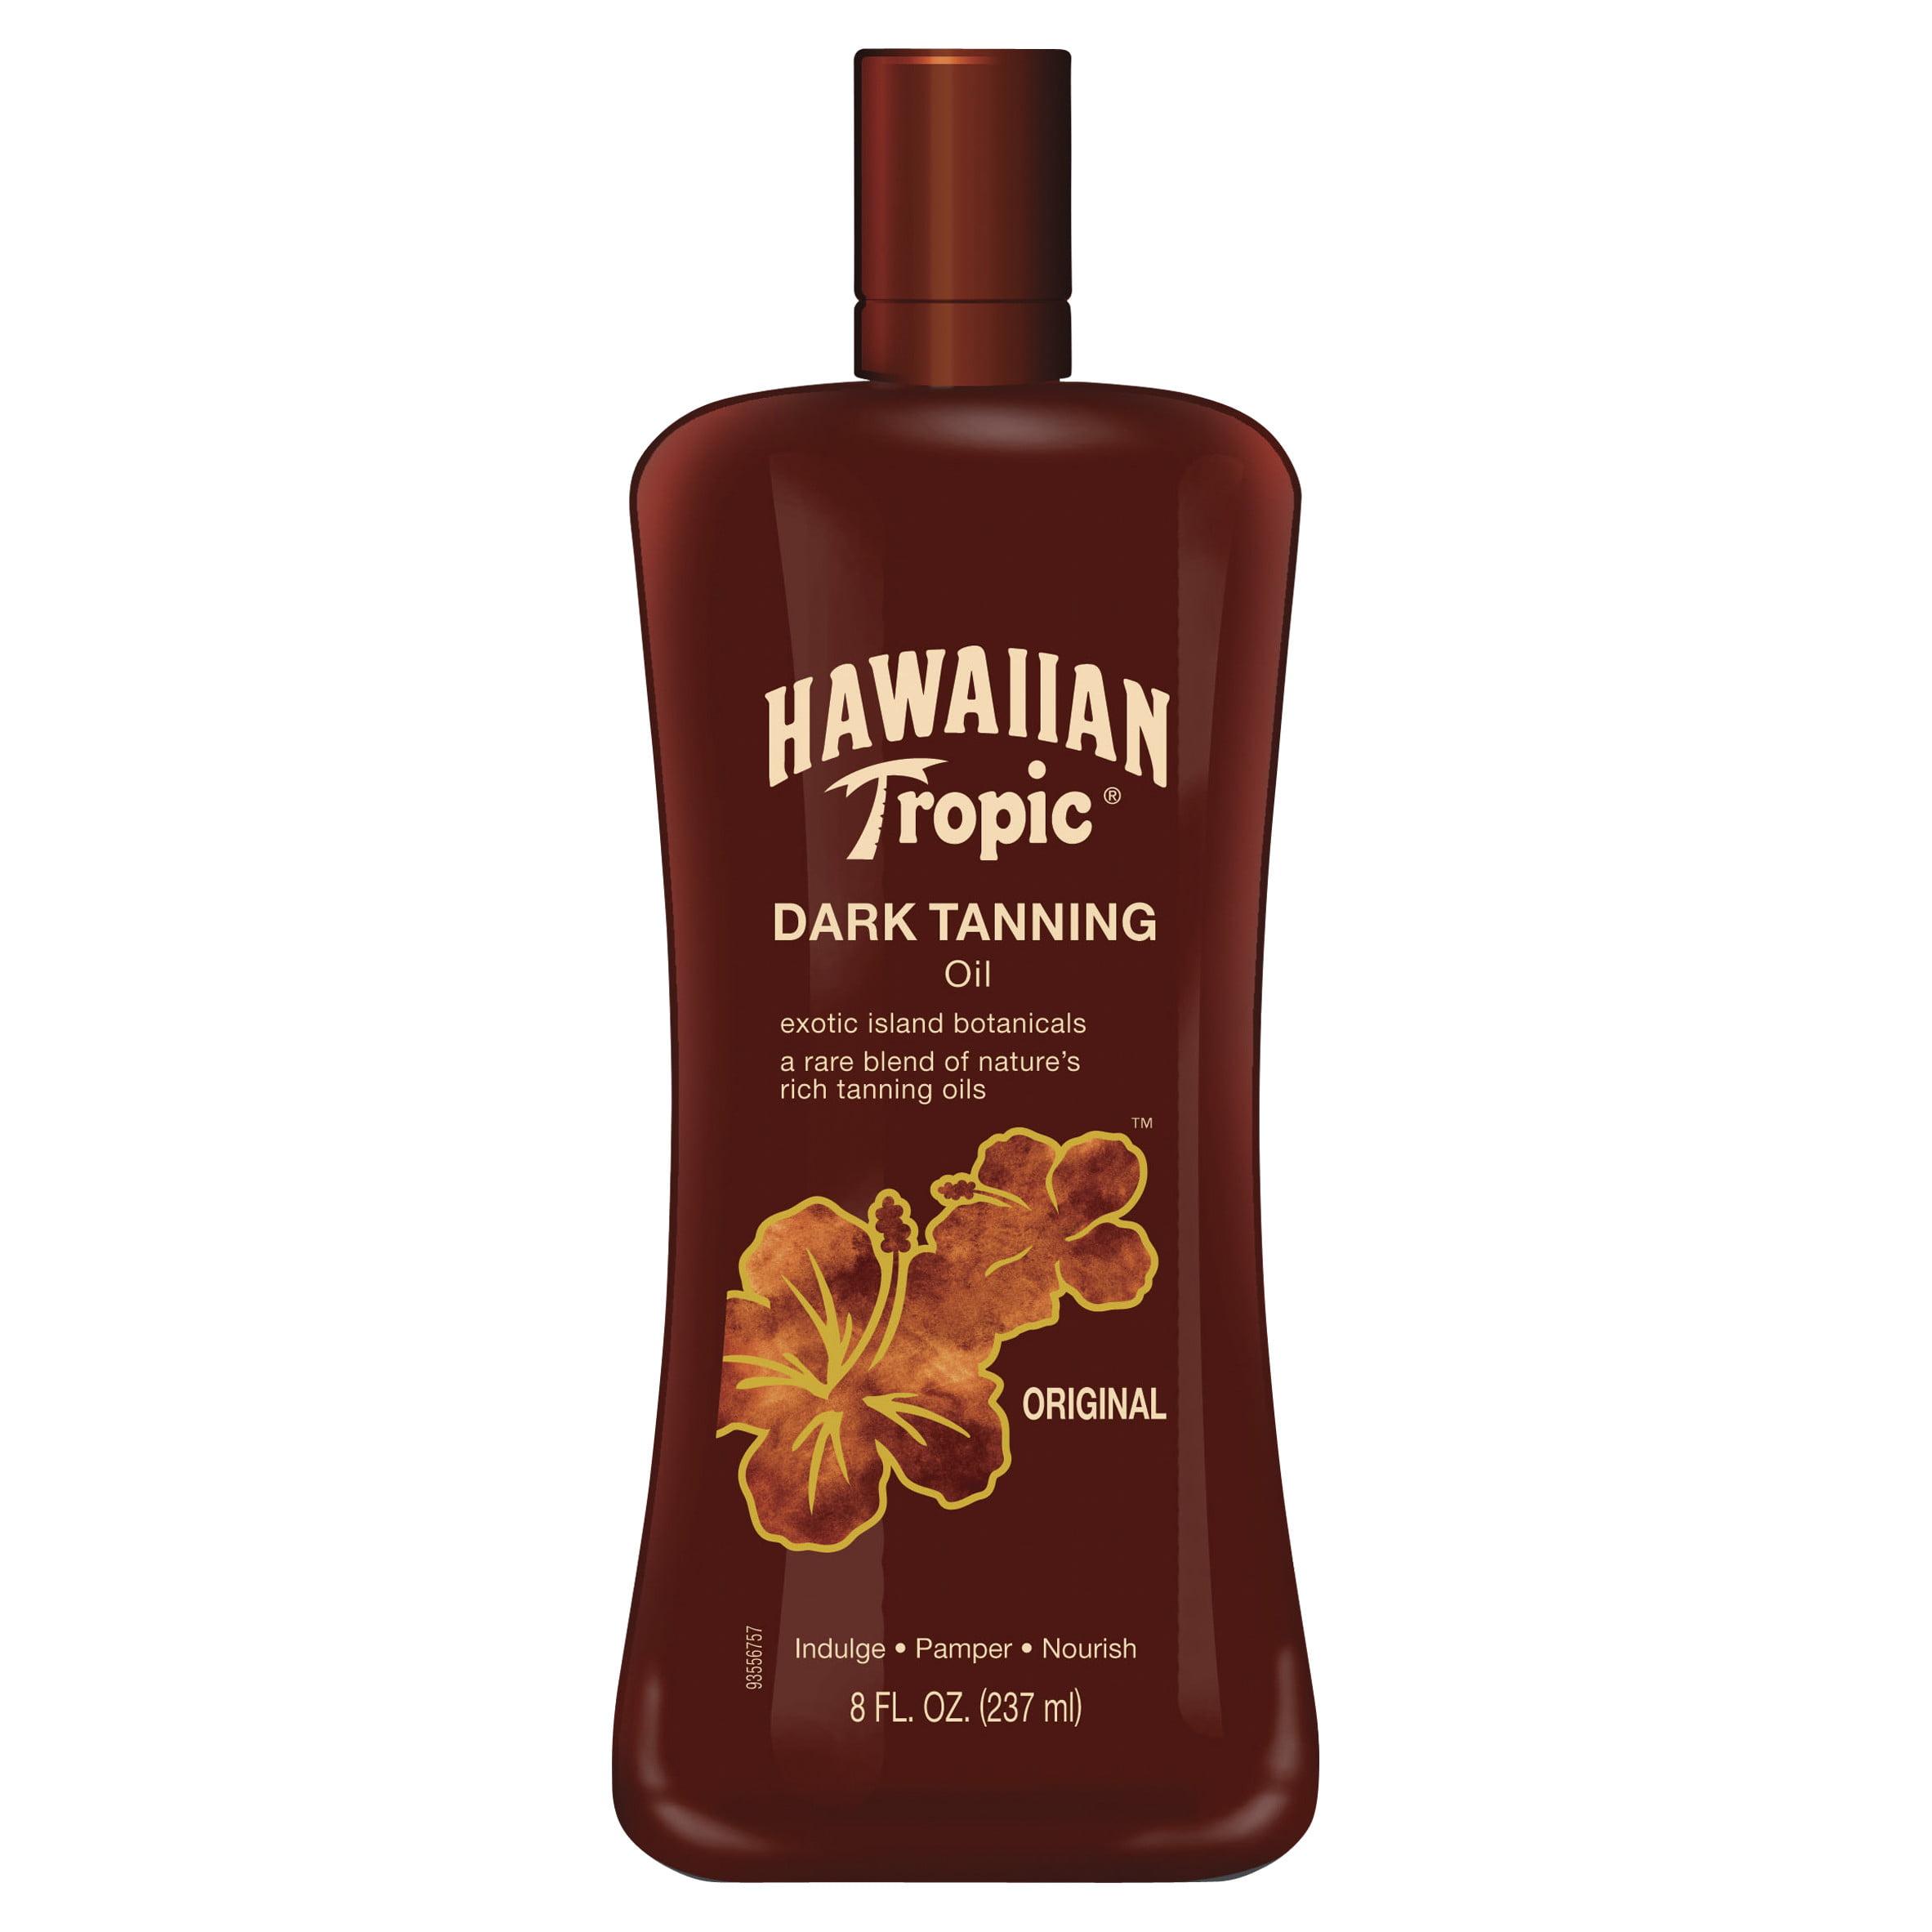 Hawaiian Tropic Dark Tanning Oil - 8 Ounces